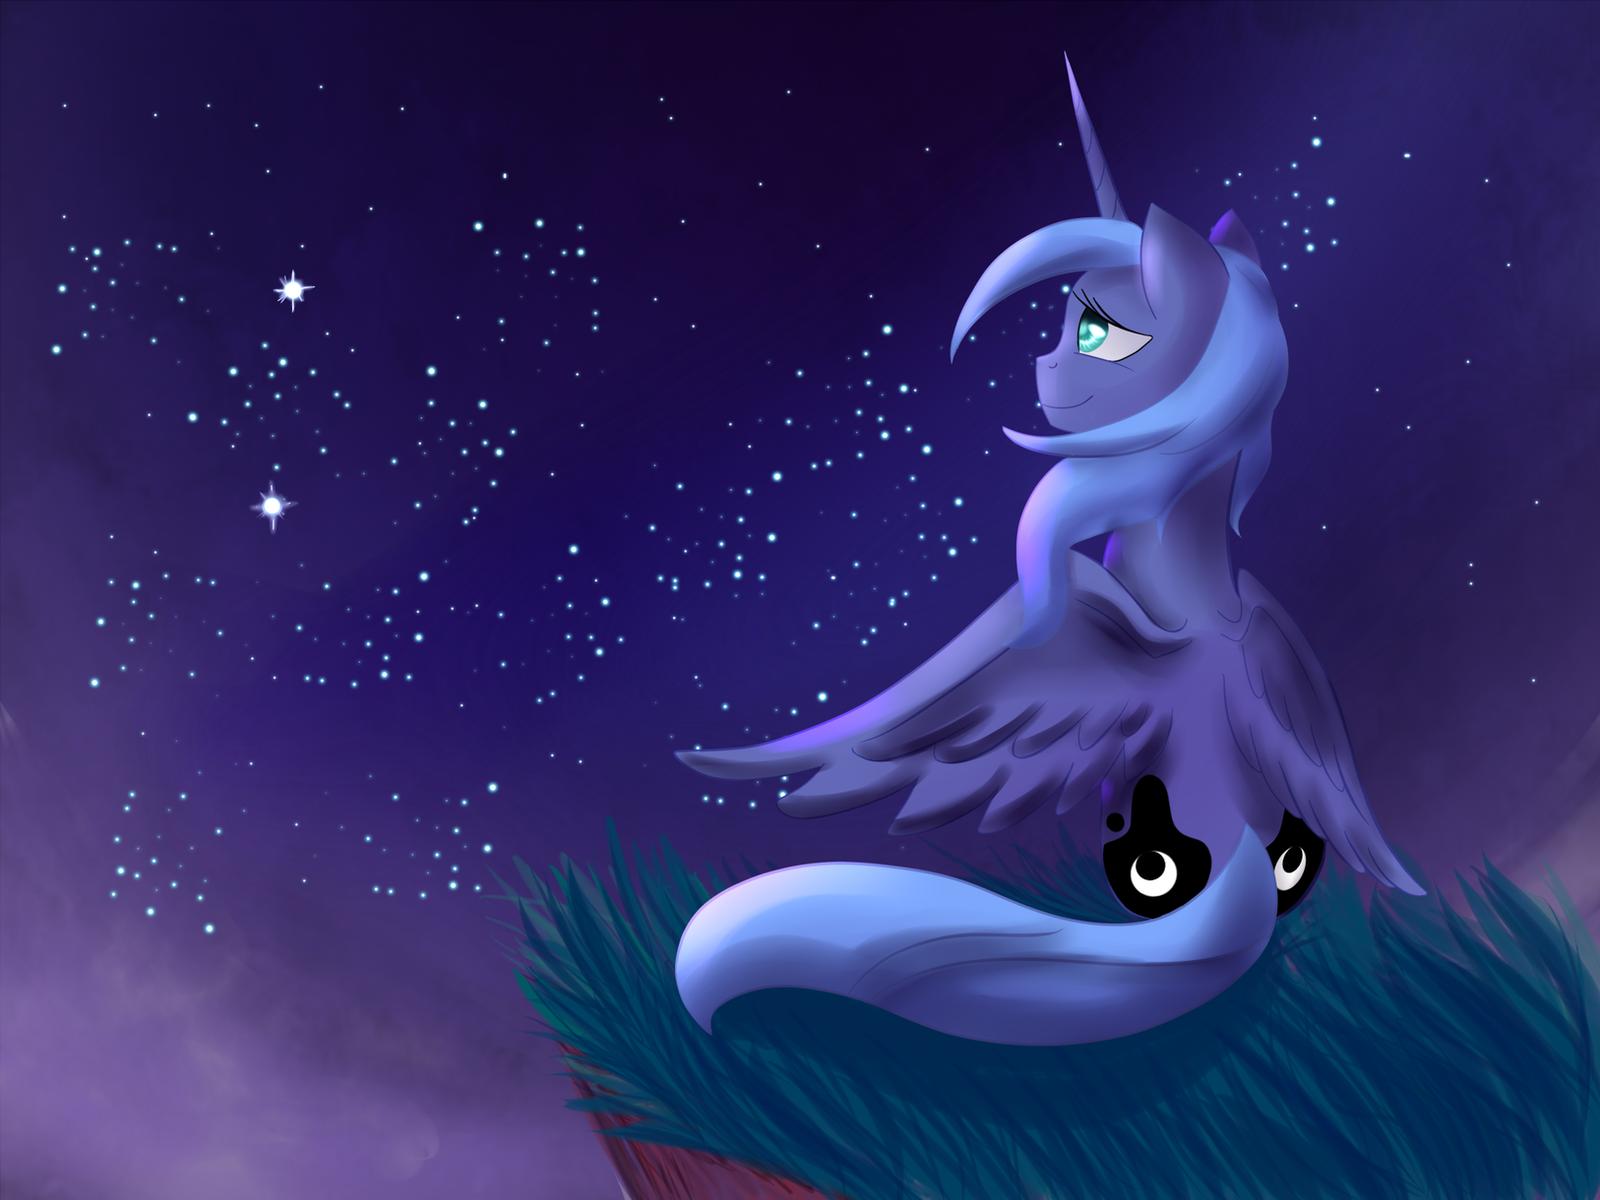 Luna at night by Lanternae